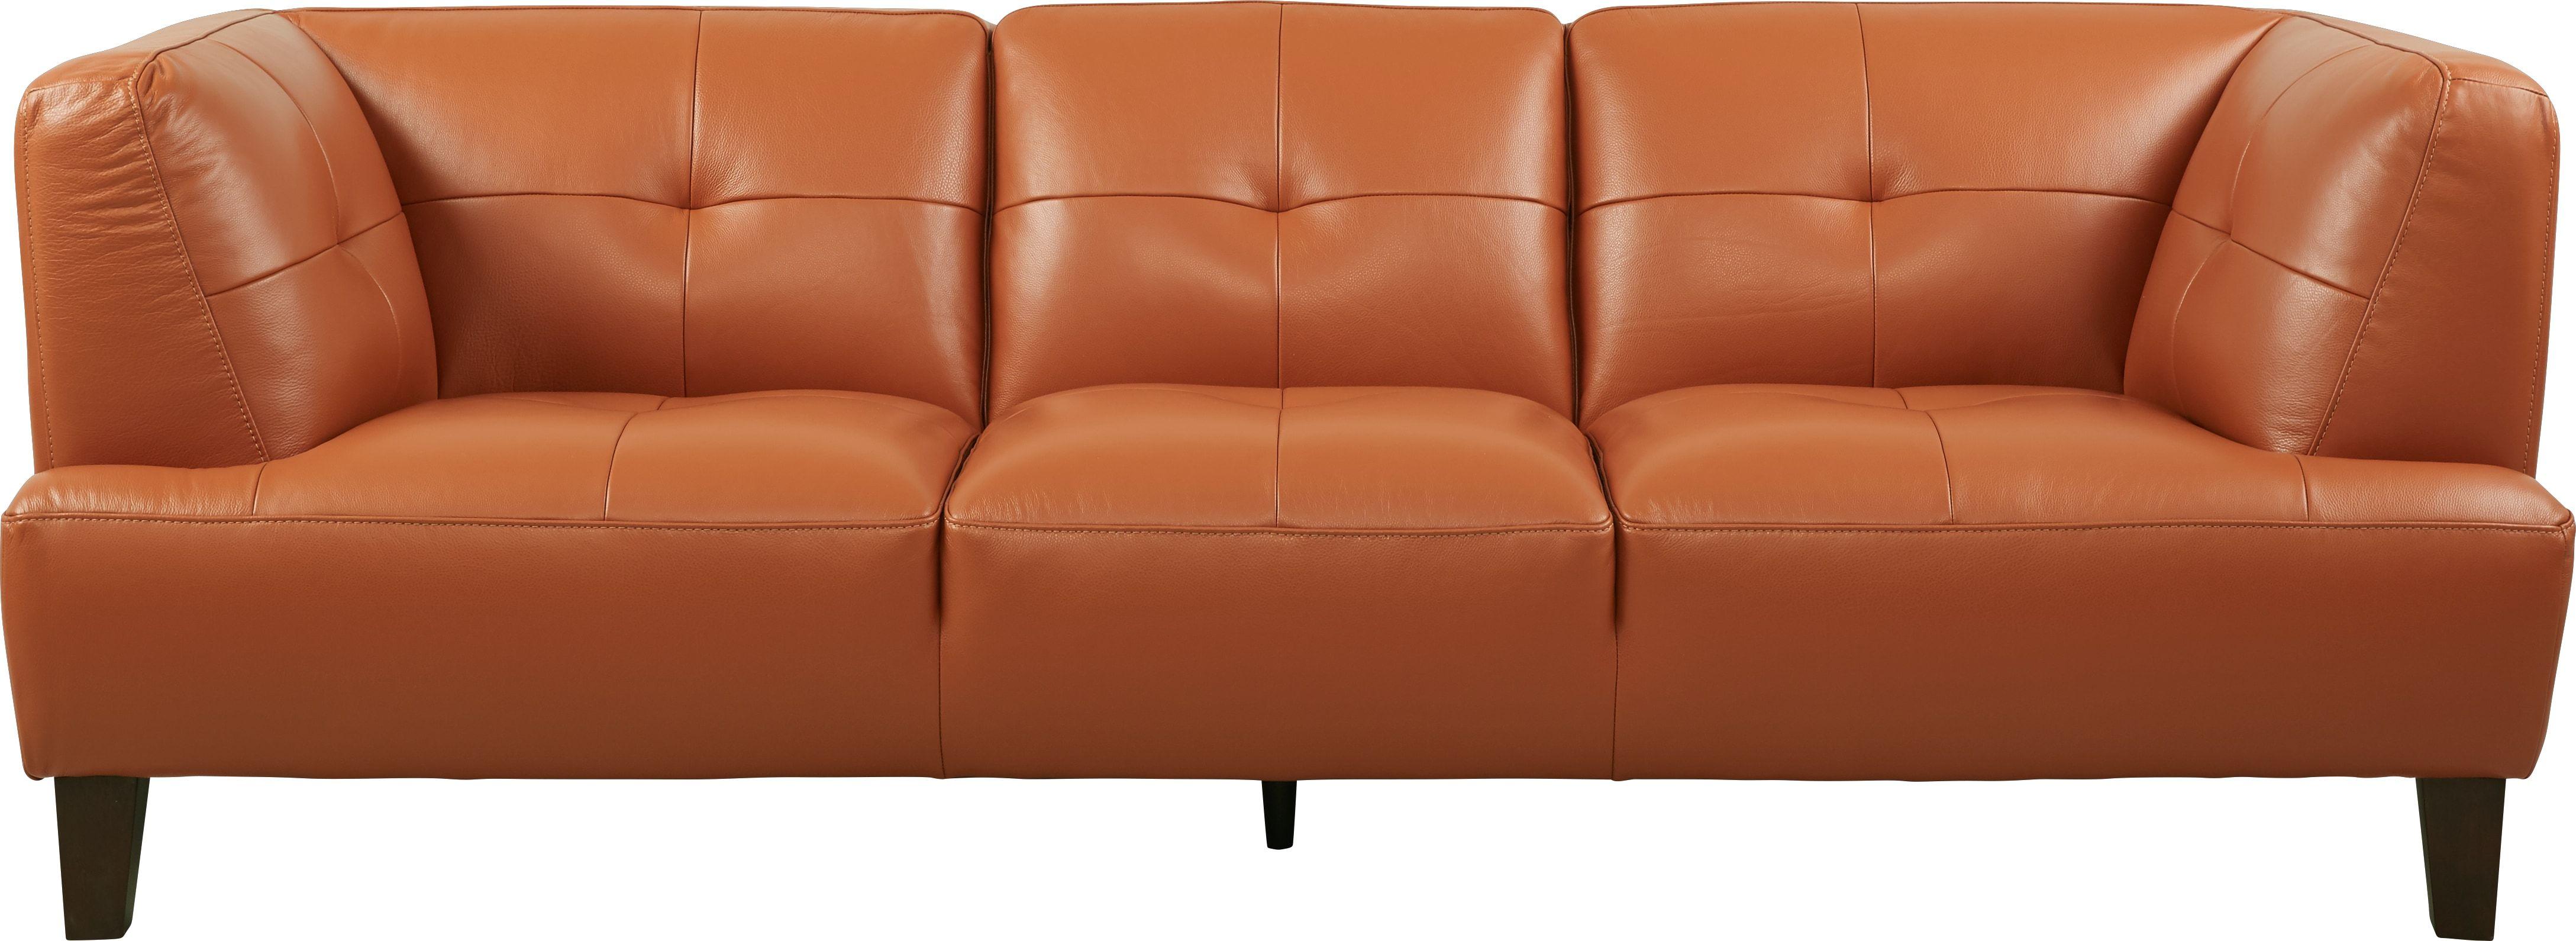 Villa Capri Orange Leather Sofa Orange Leather Sofas Orange